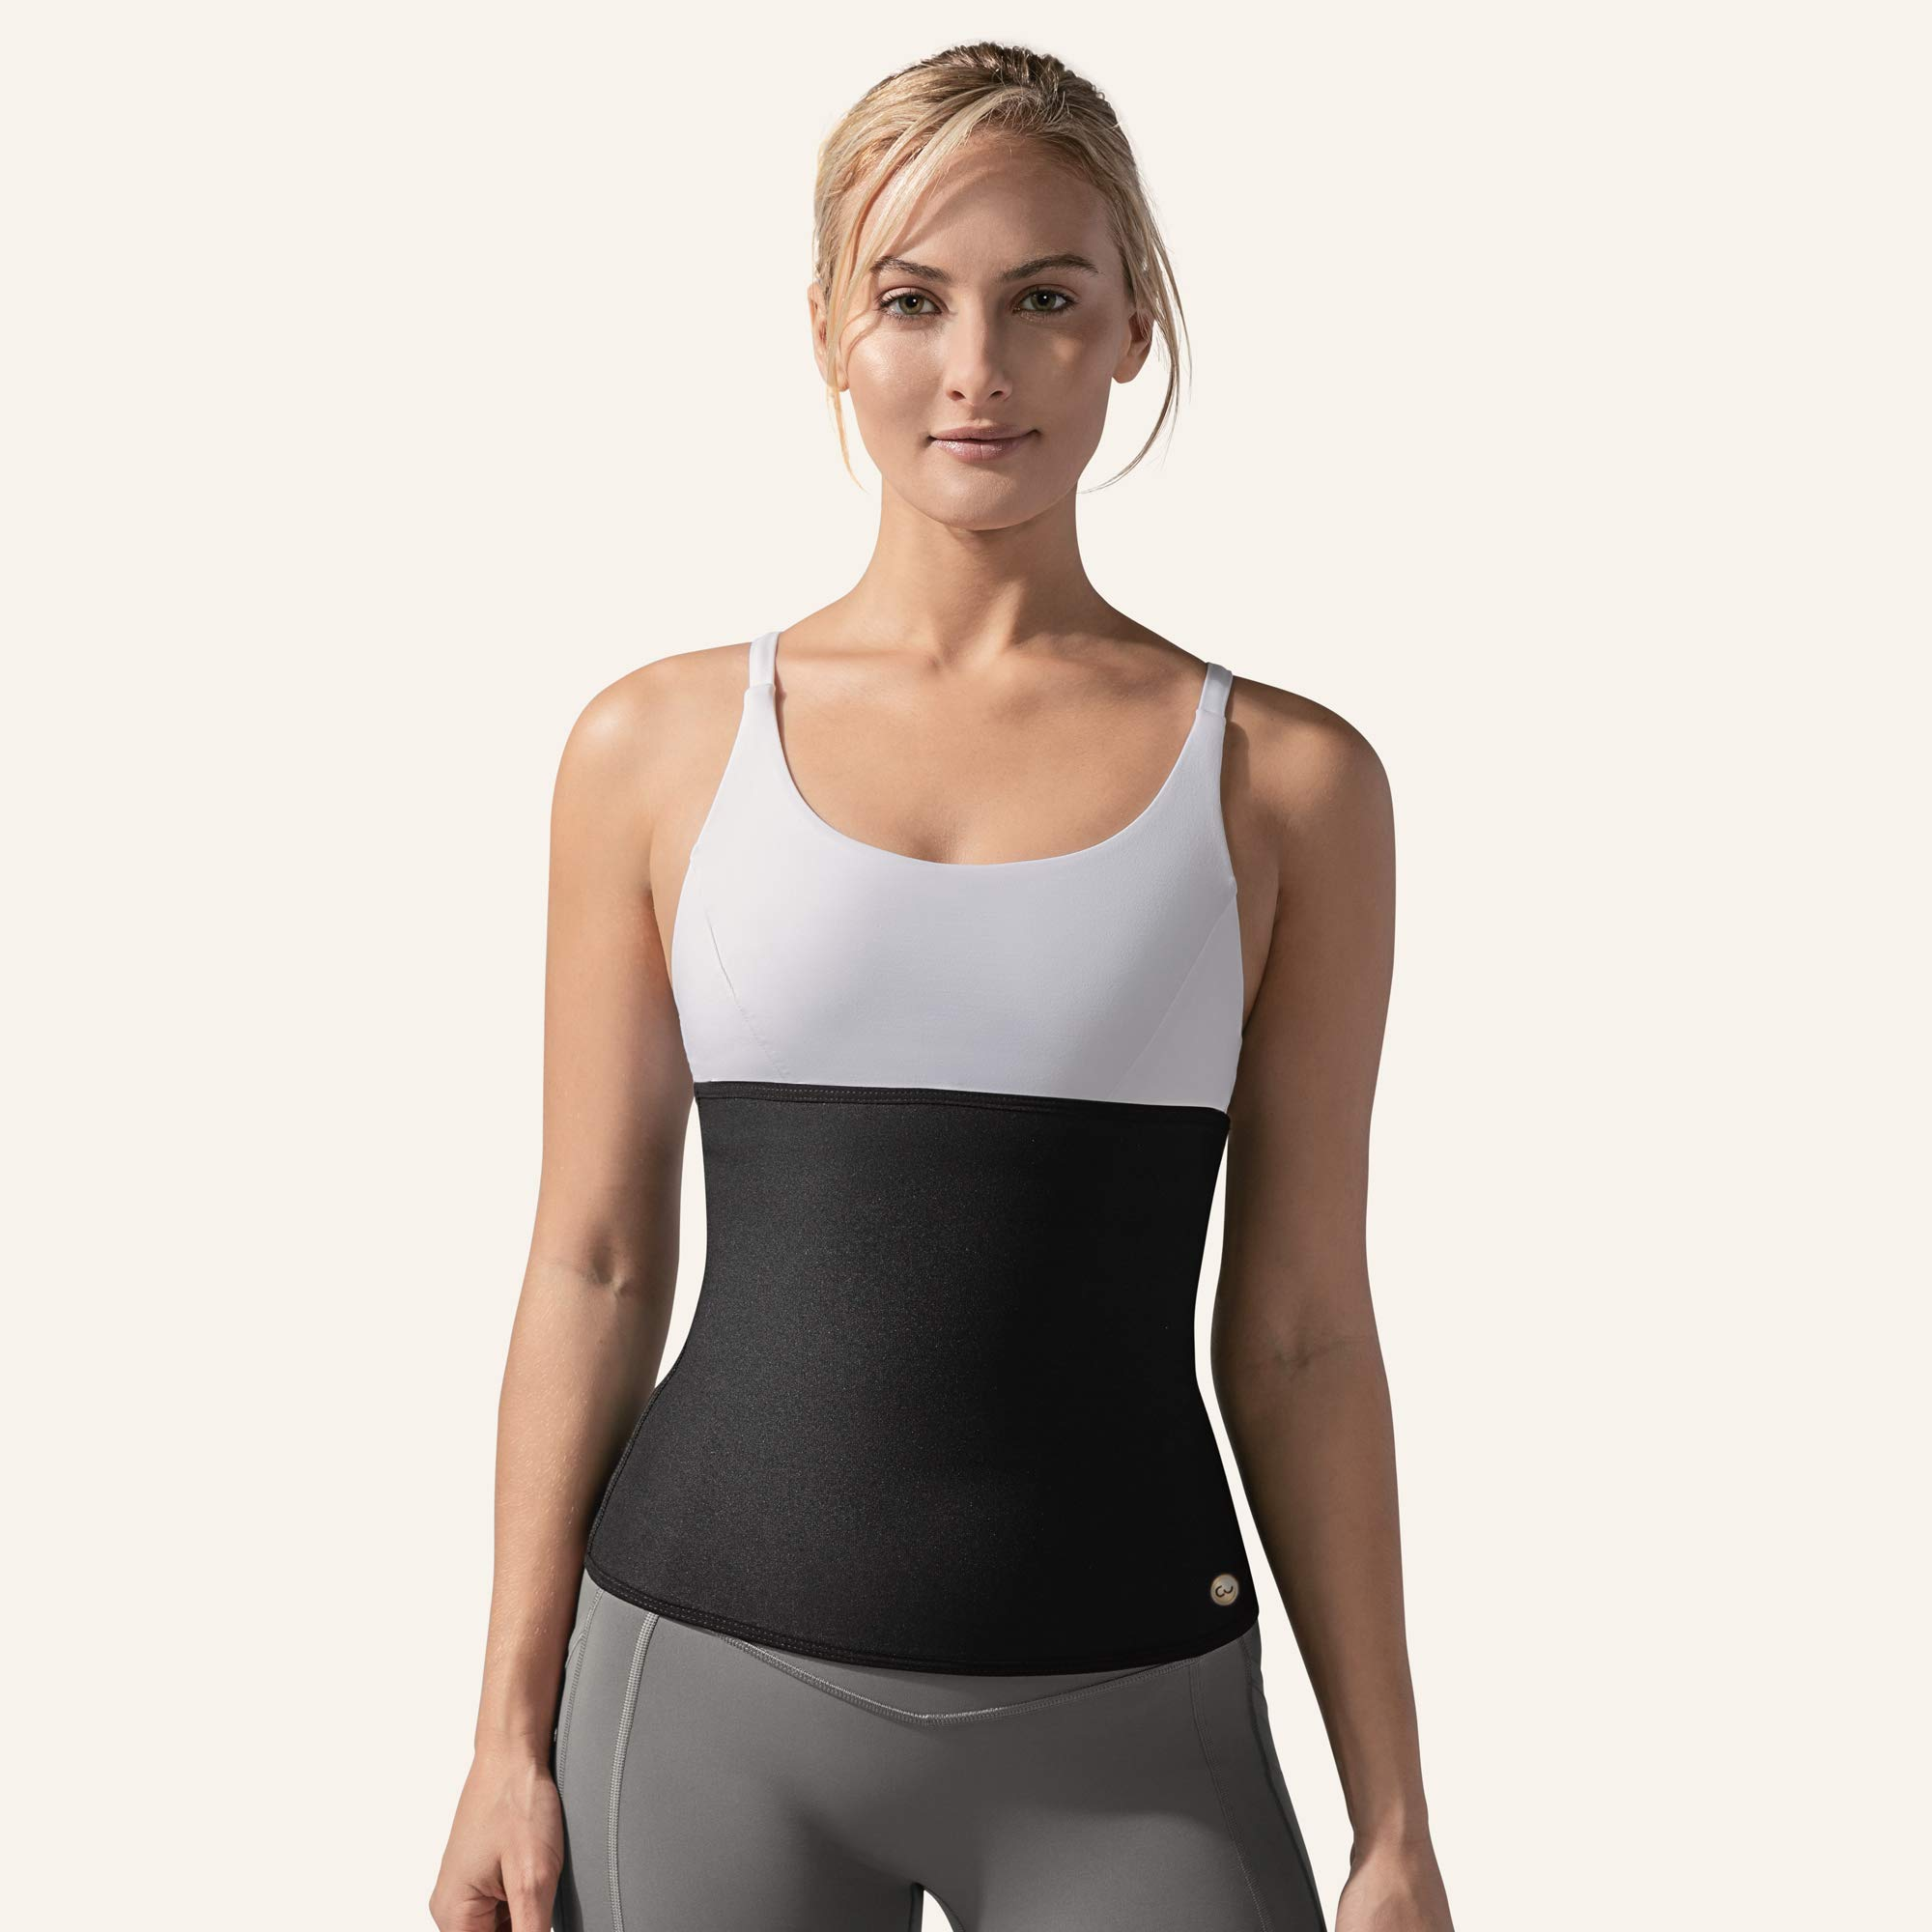 Copper Slim Compression Waist Belt for Women - Workout Belt Increases Sweat & Circulation (Black, S)